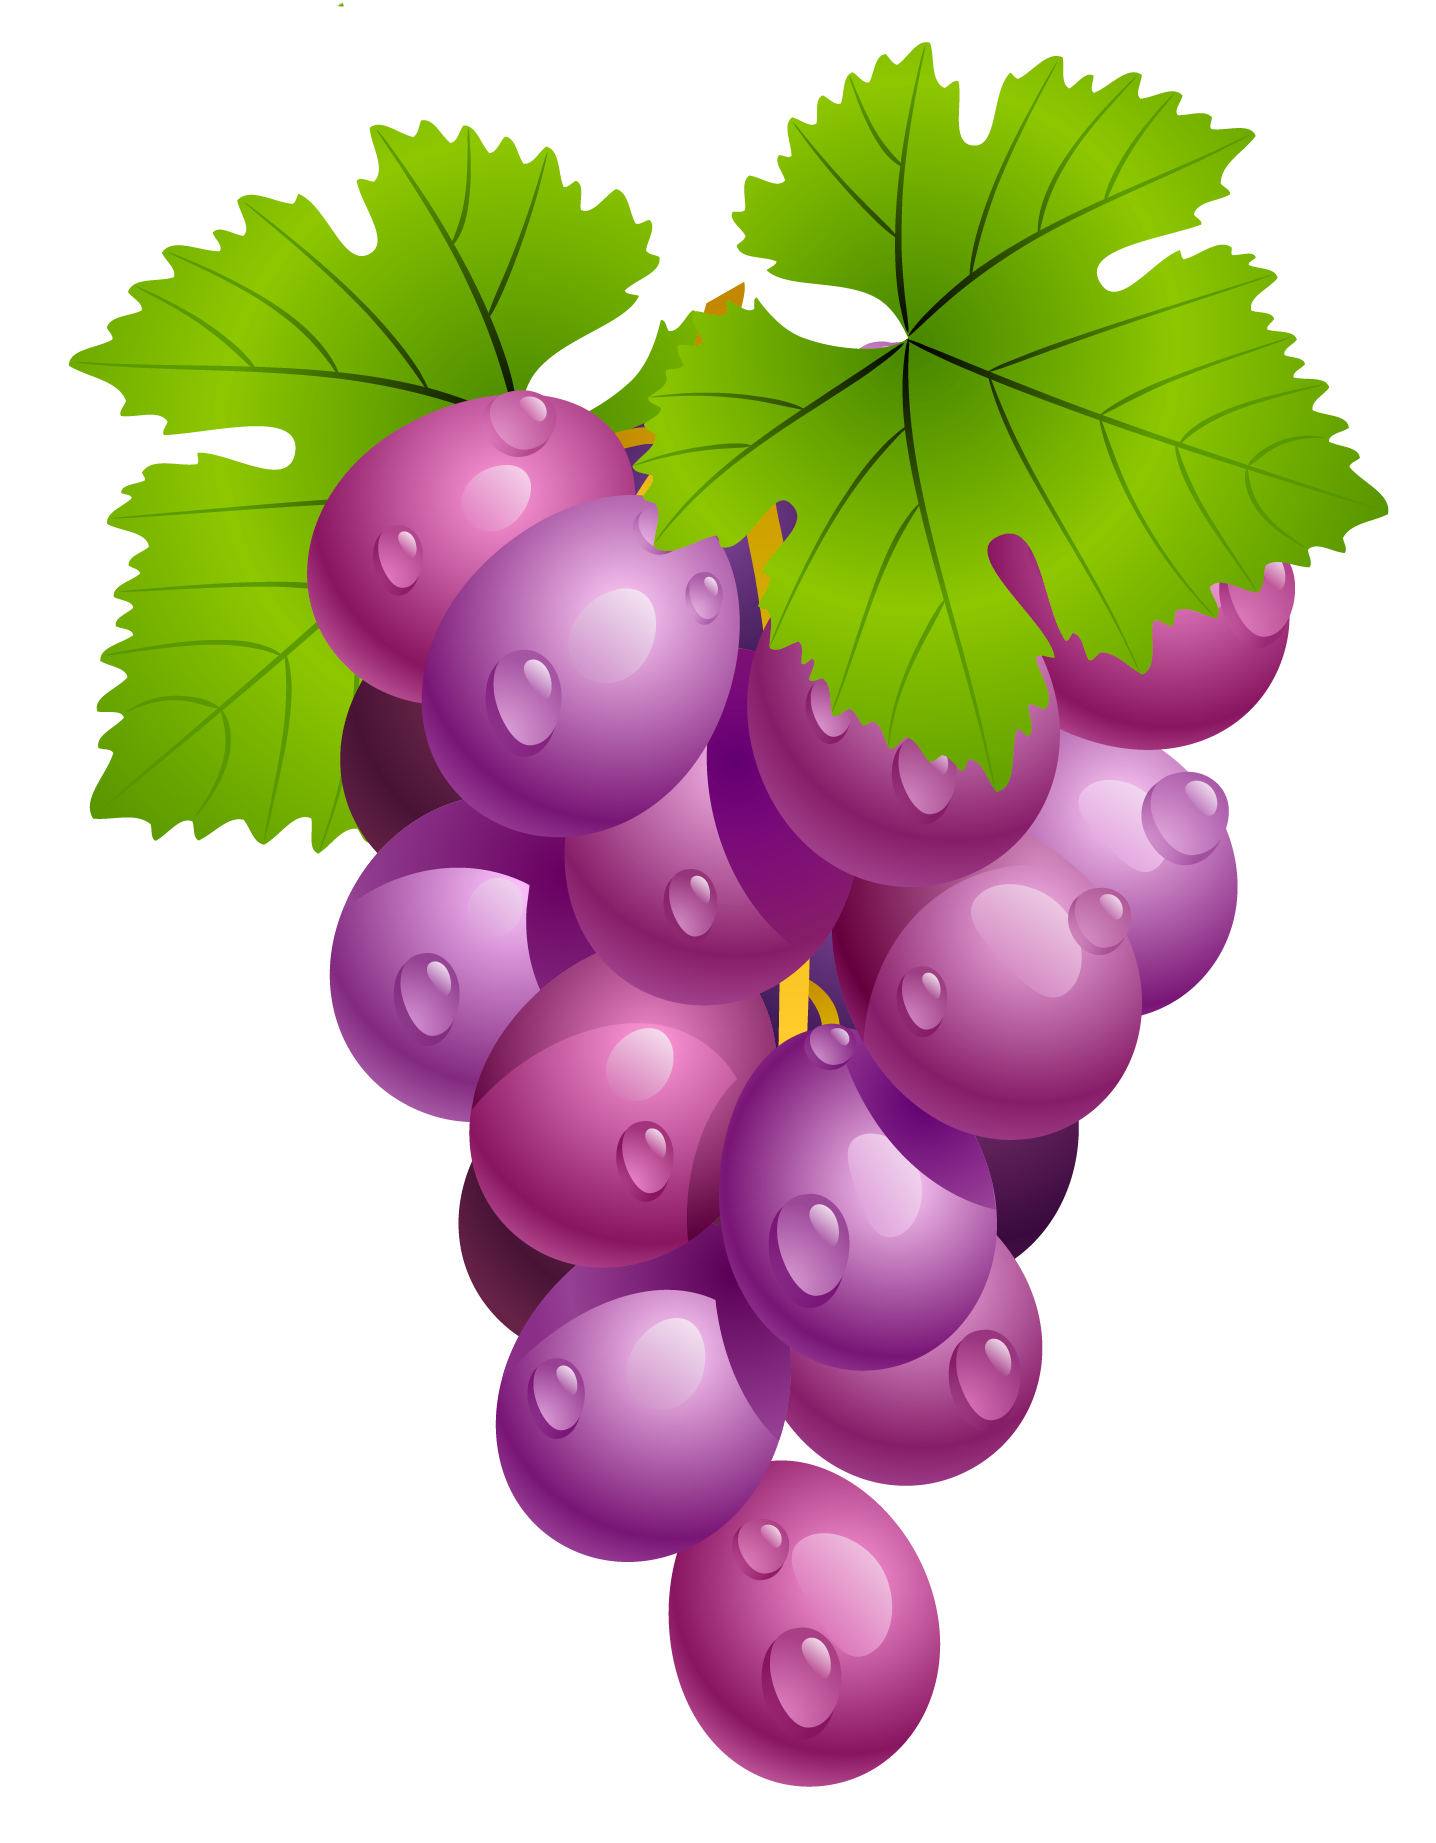 Clipart Grapes & Grapes Clip Art Images.